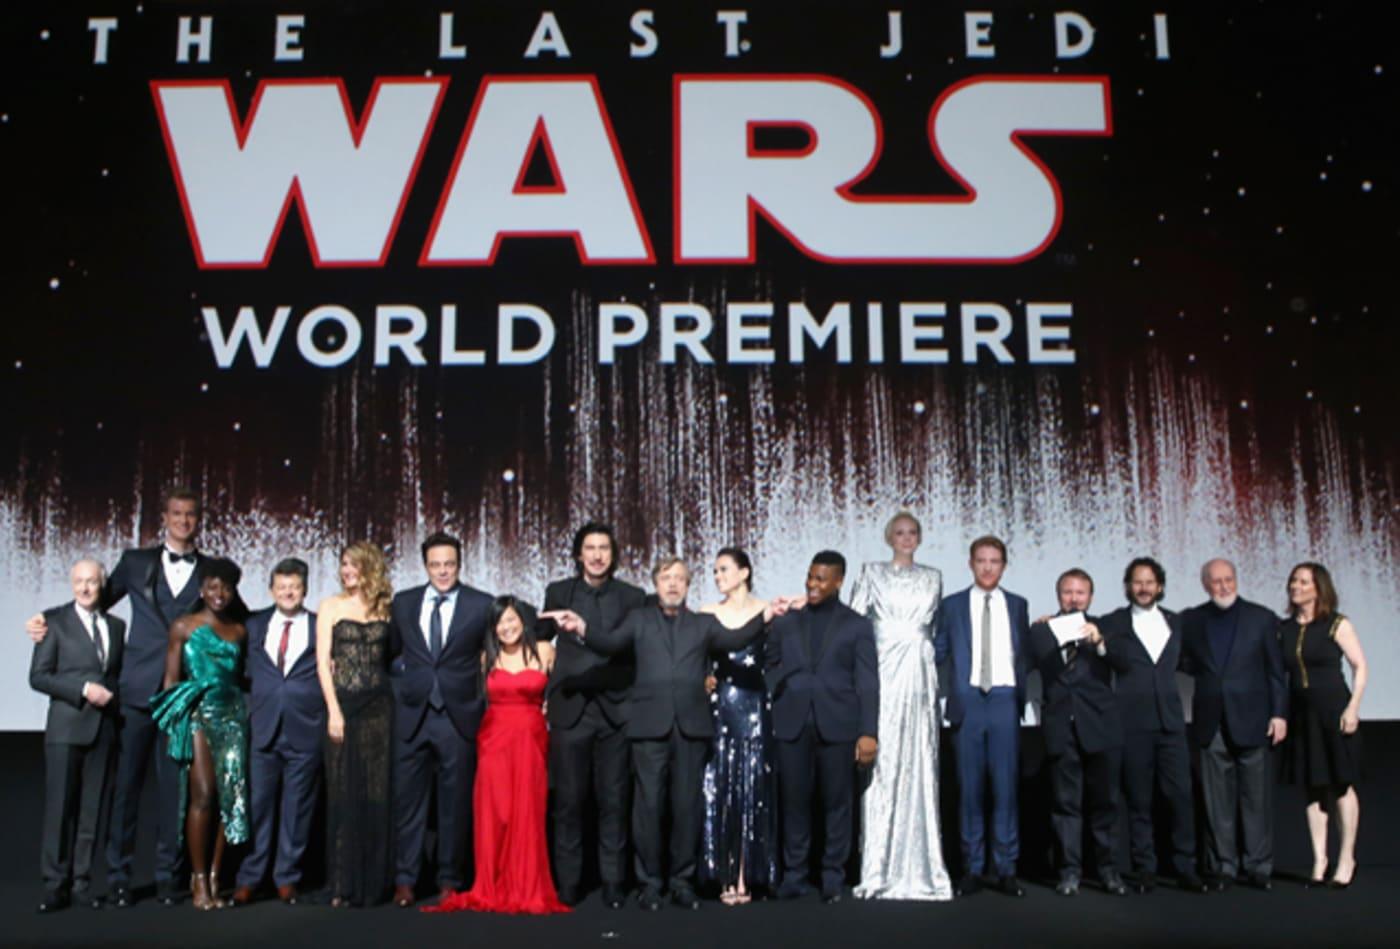 The 'Star Wars: The Last Jedi' cast at the World Premiere